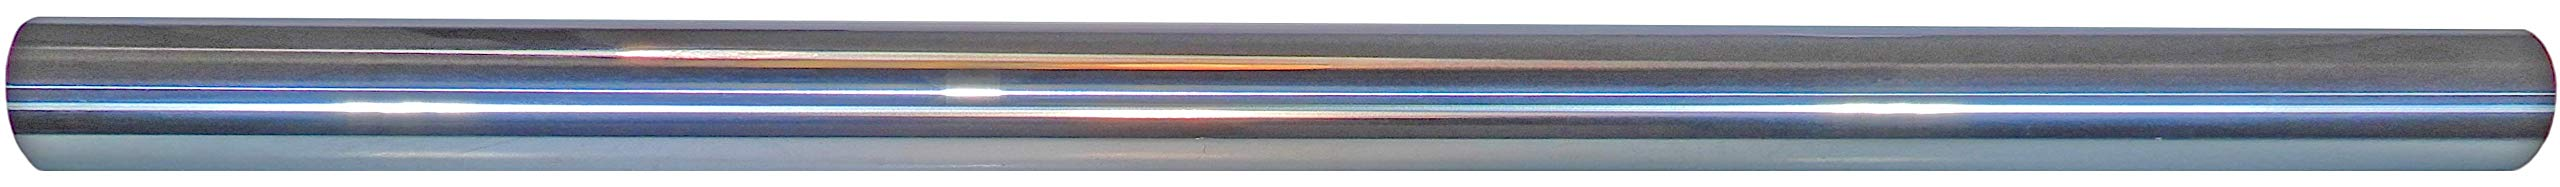 Castlebar 7mm X 330mm, Grade 9008/C2, Ground